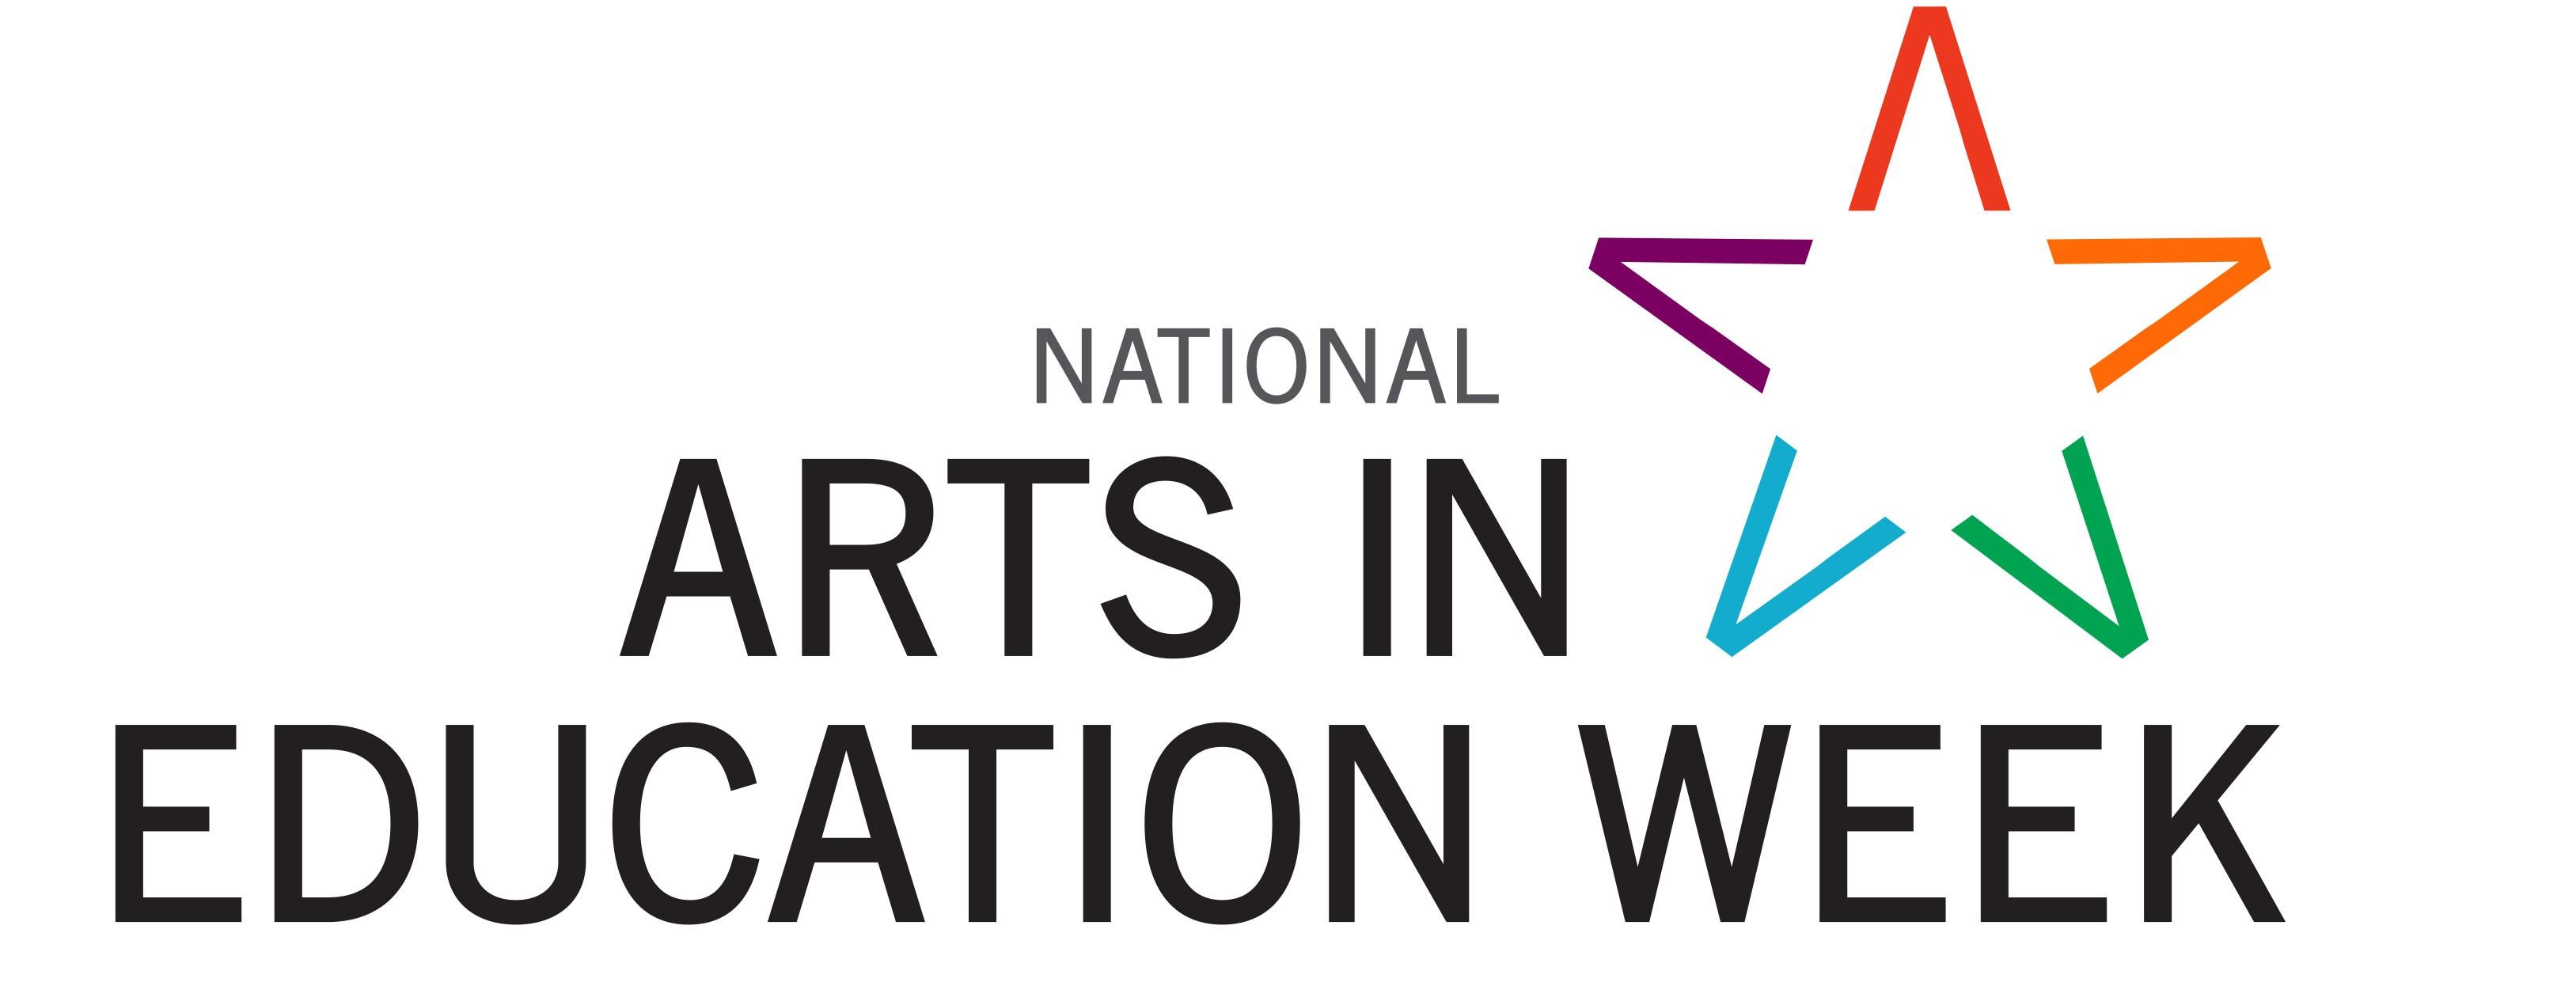 Encourage Creativity During #ArtsEdWeek